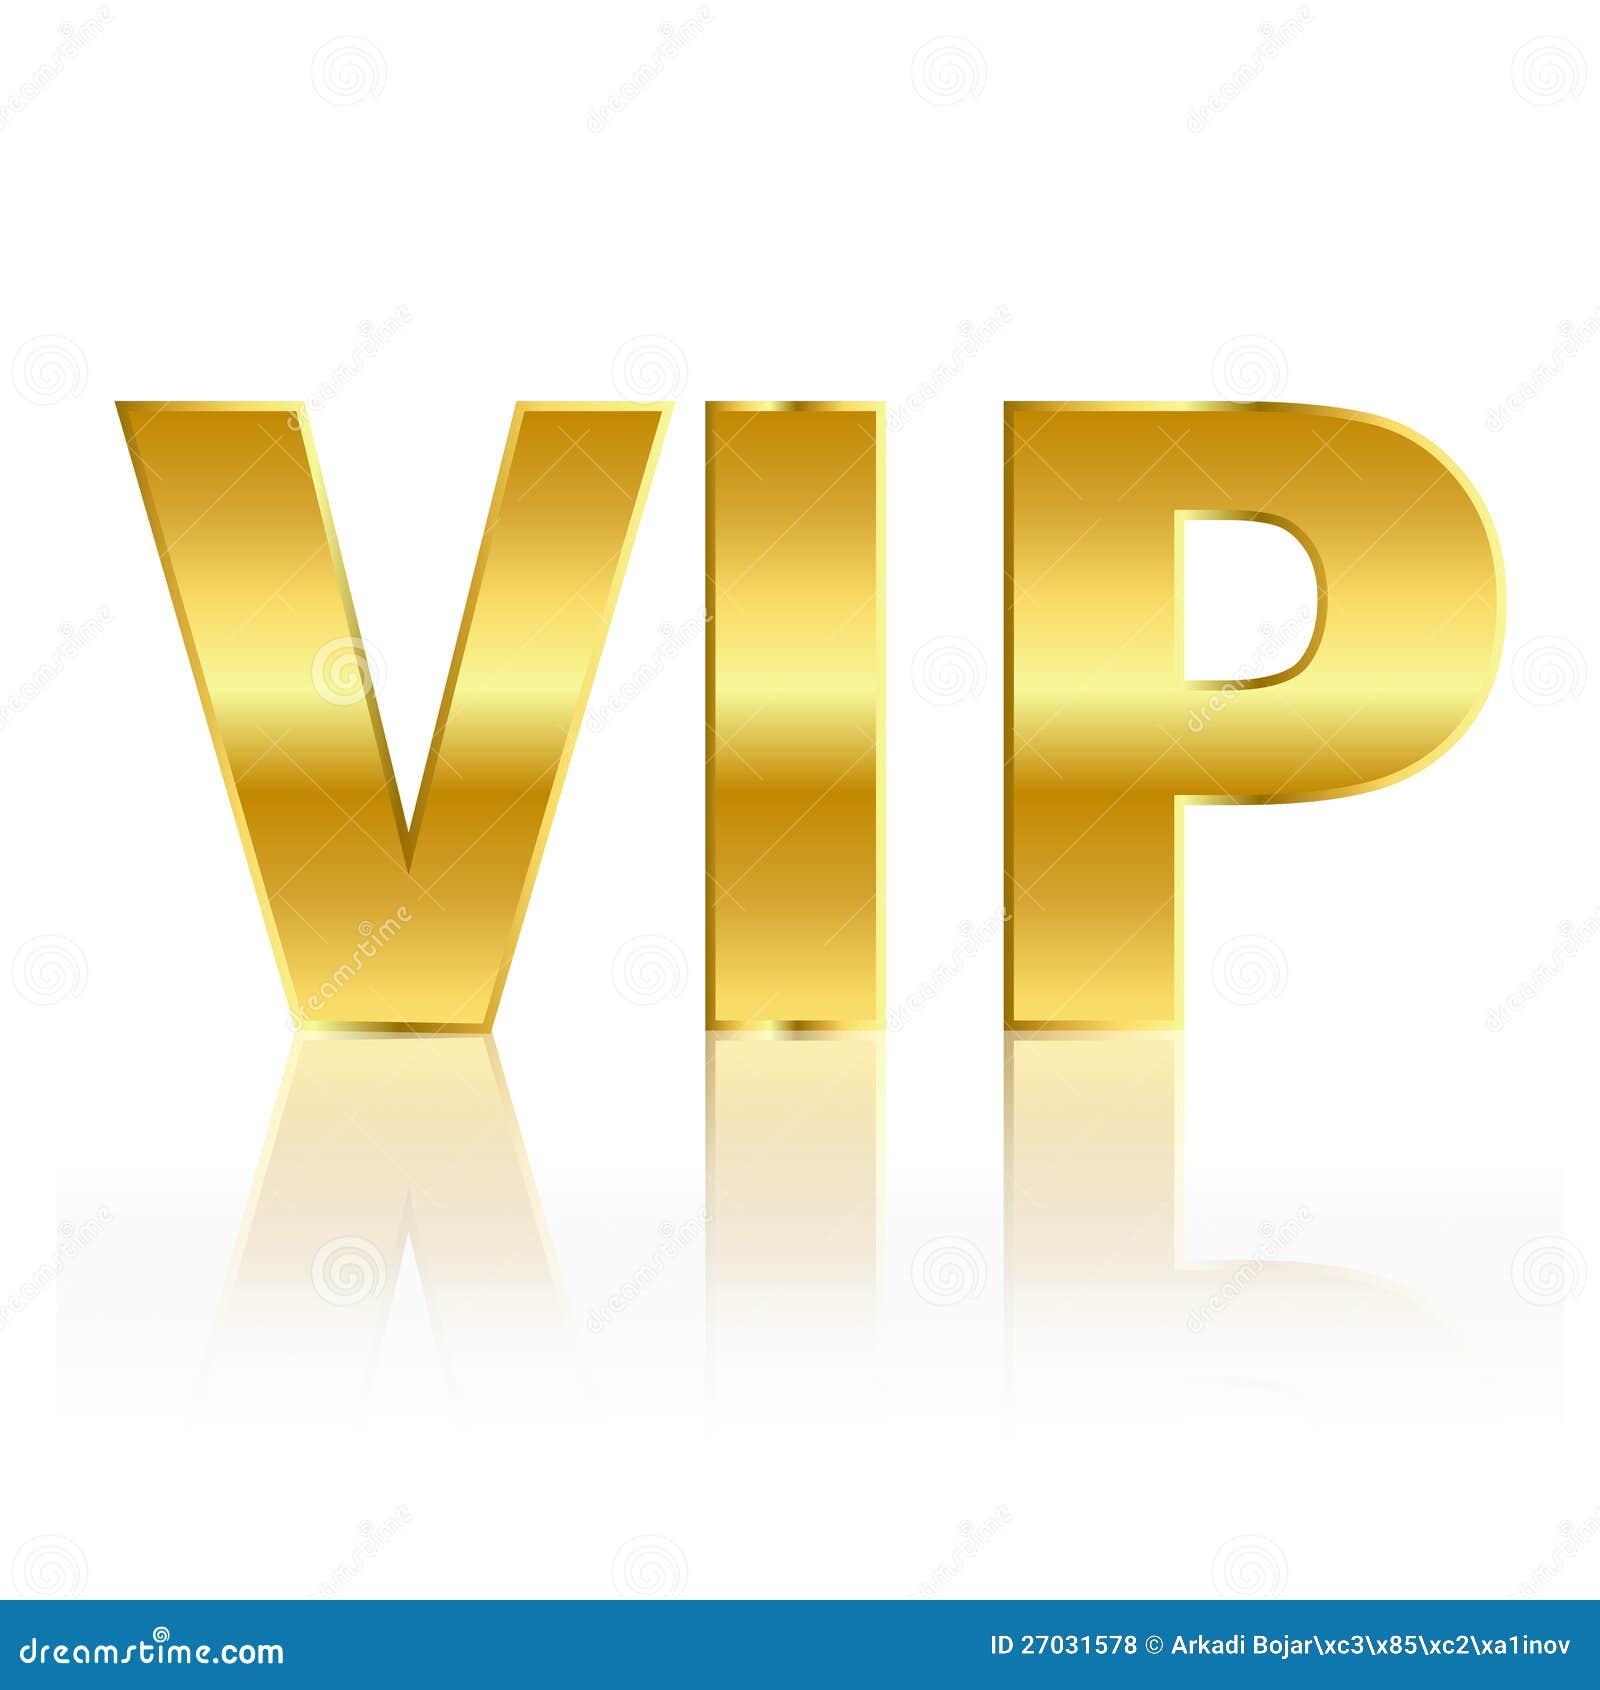 Vip Gold Symbol Royalty Free Stock Photos - Image: 27031578